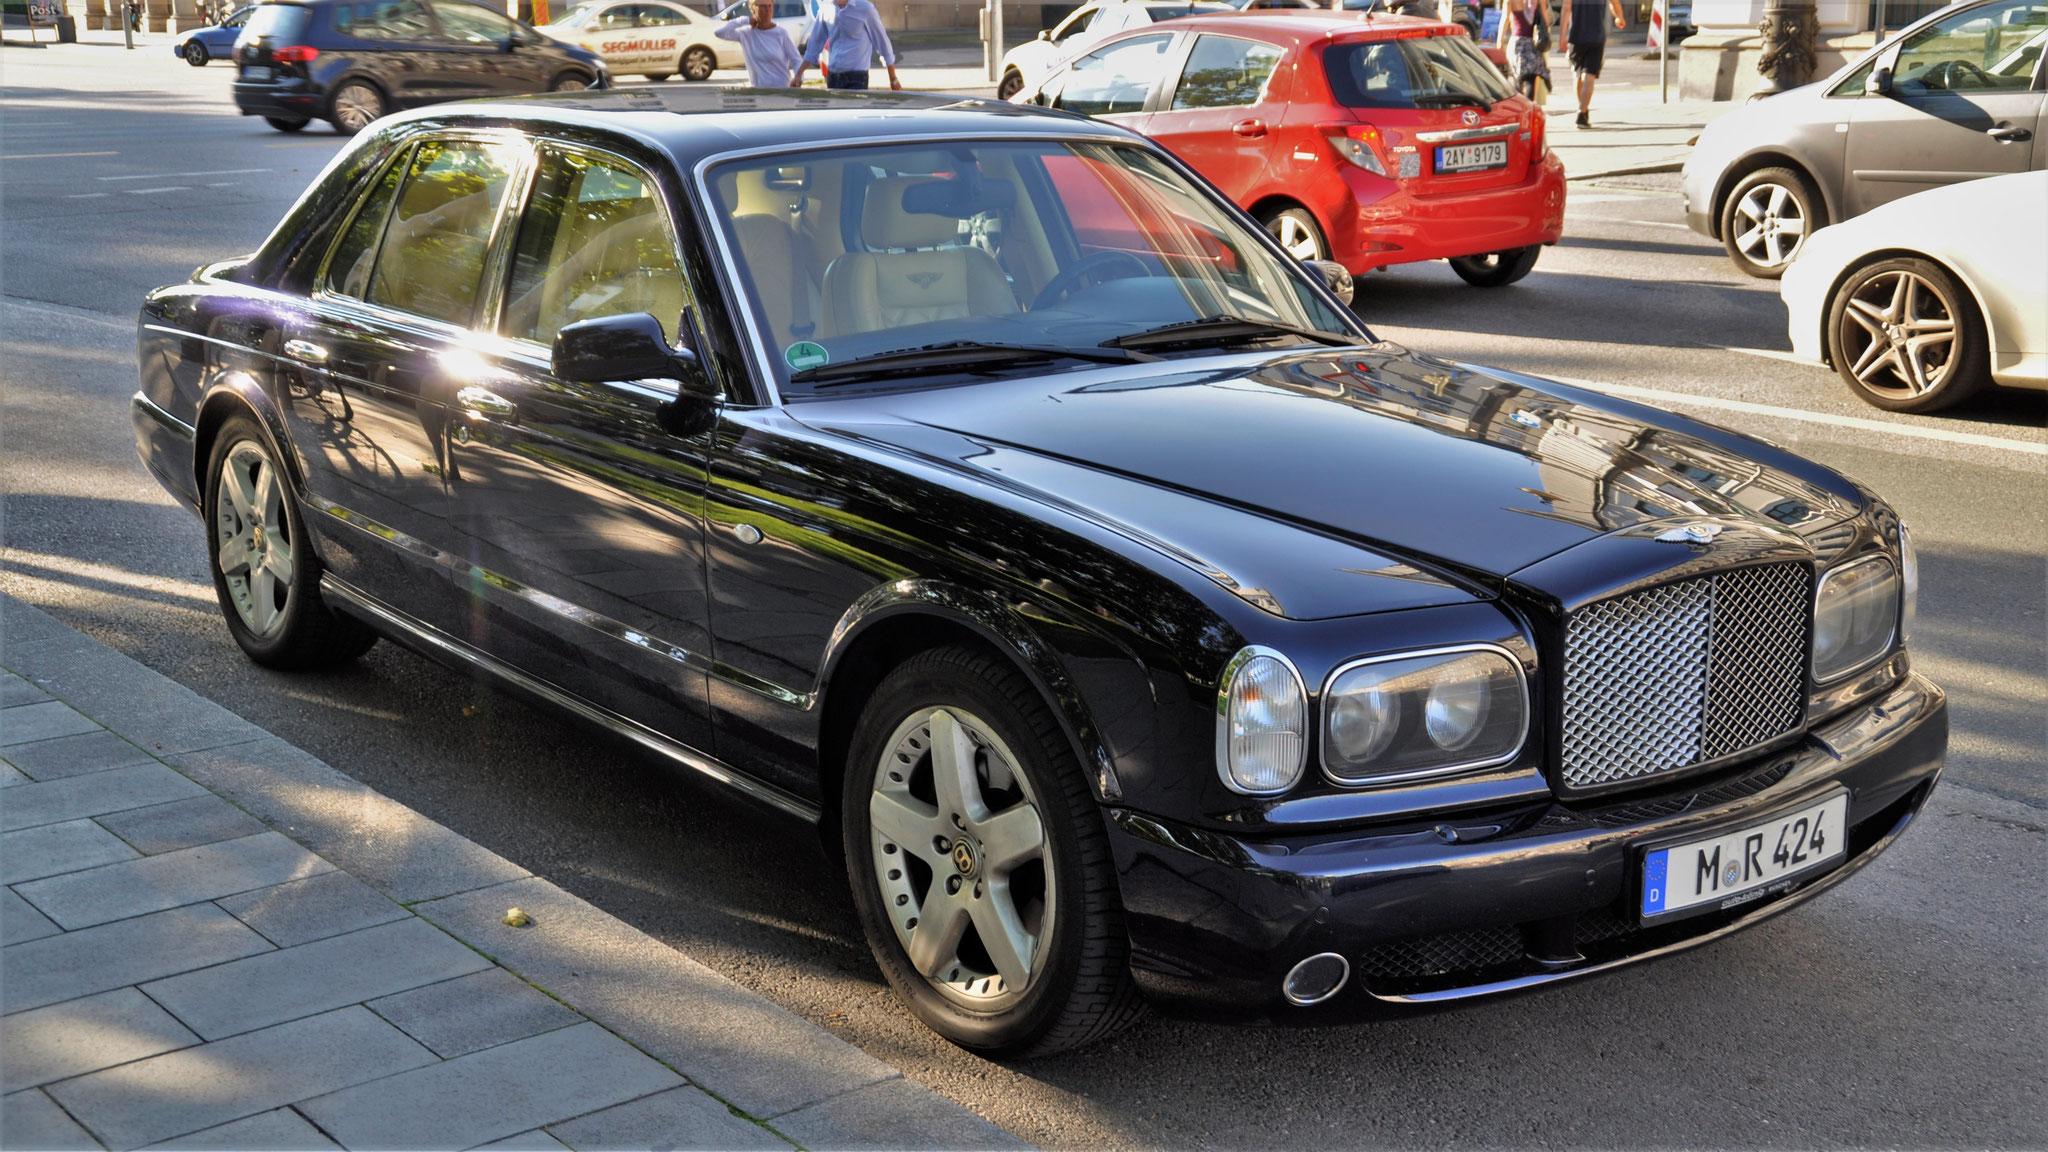 Bentley Arnage - M-R-424